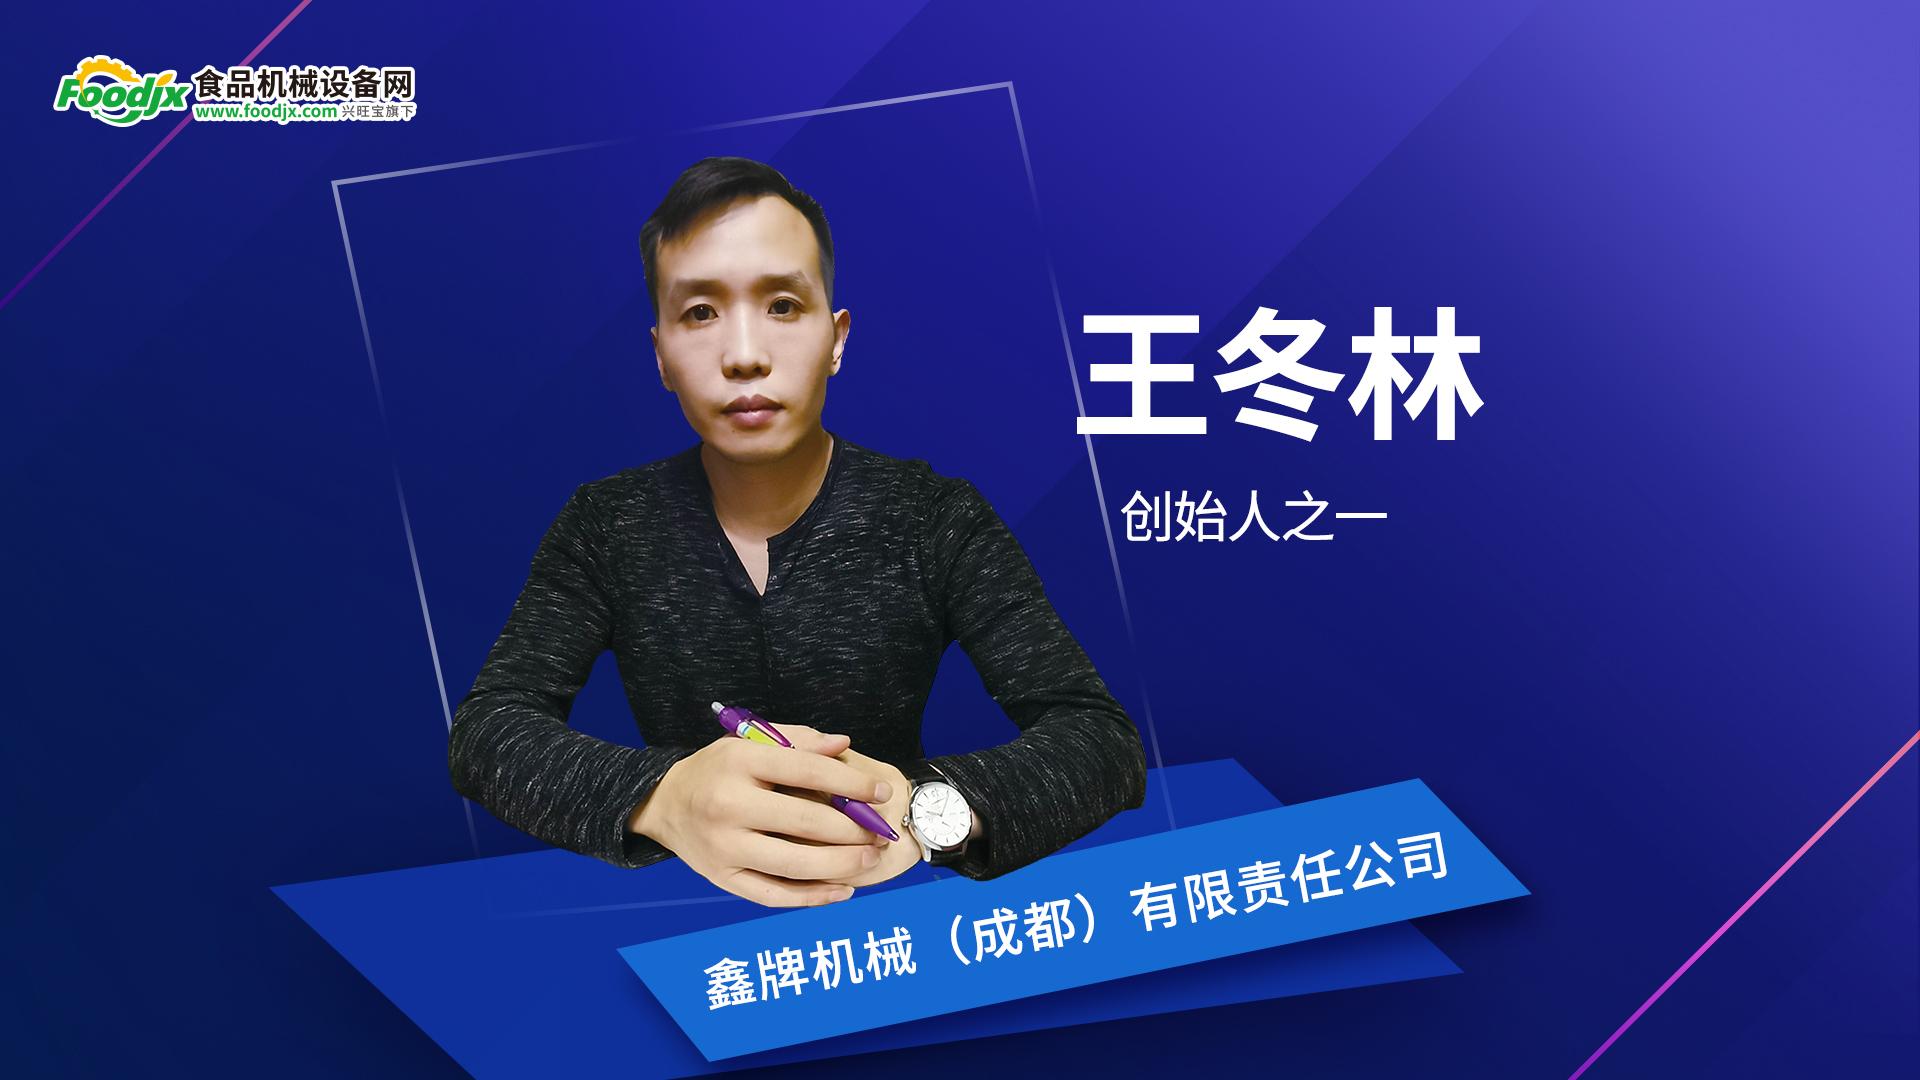 foodjx专访鑫牌机械(成都)有限责任公司